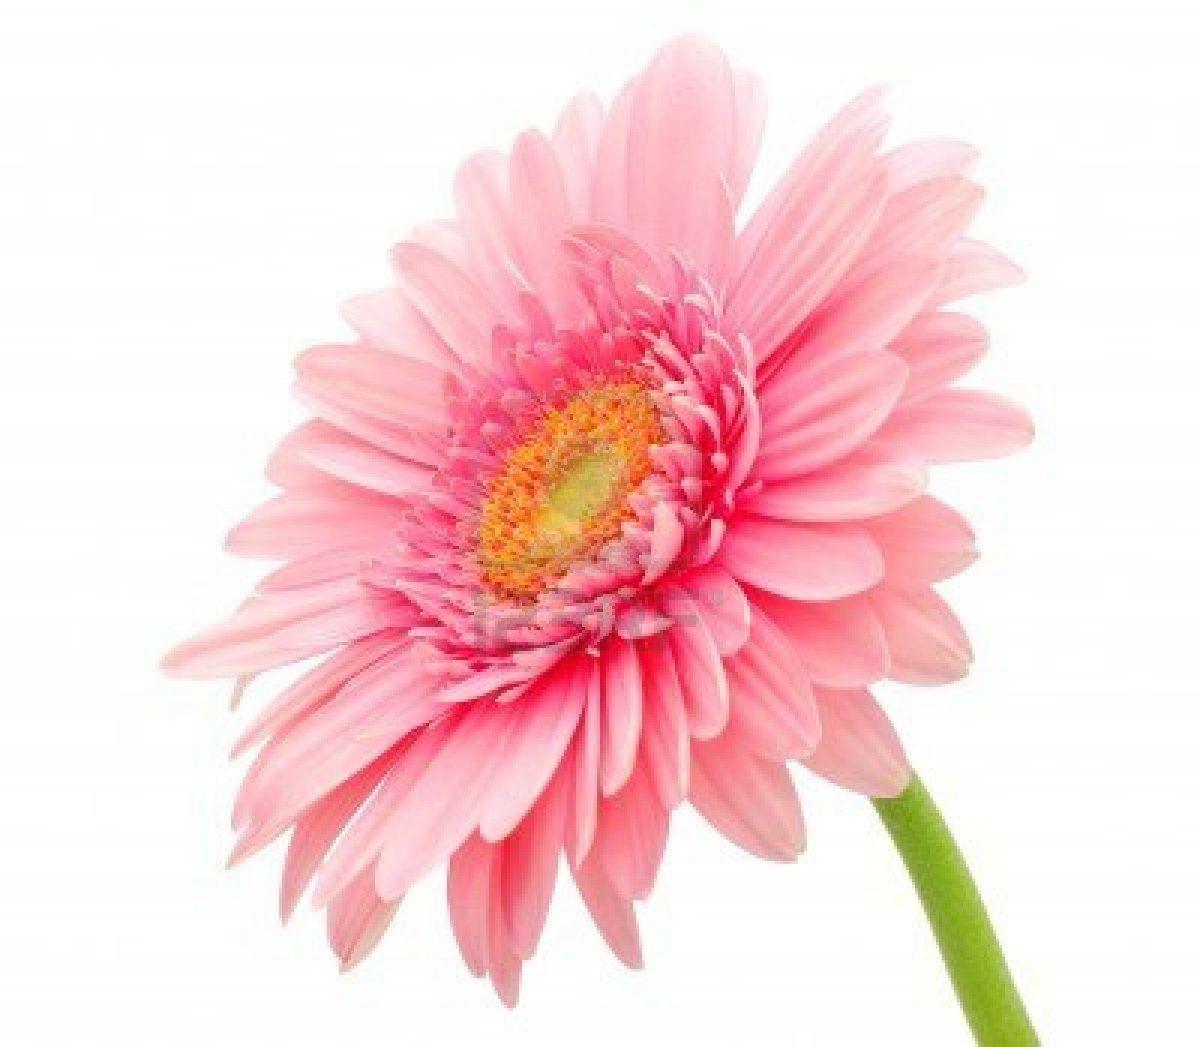 Pink Gerbera Daisy Arts And Crafts Pinterest Gerbera Daisy